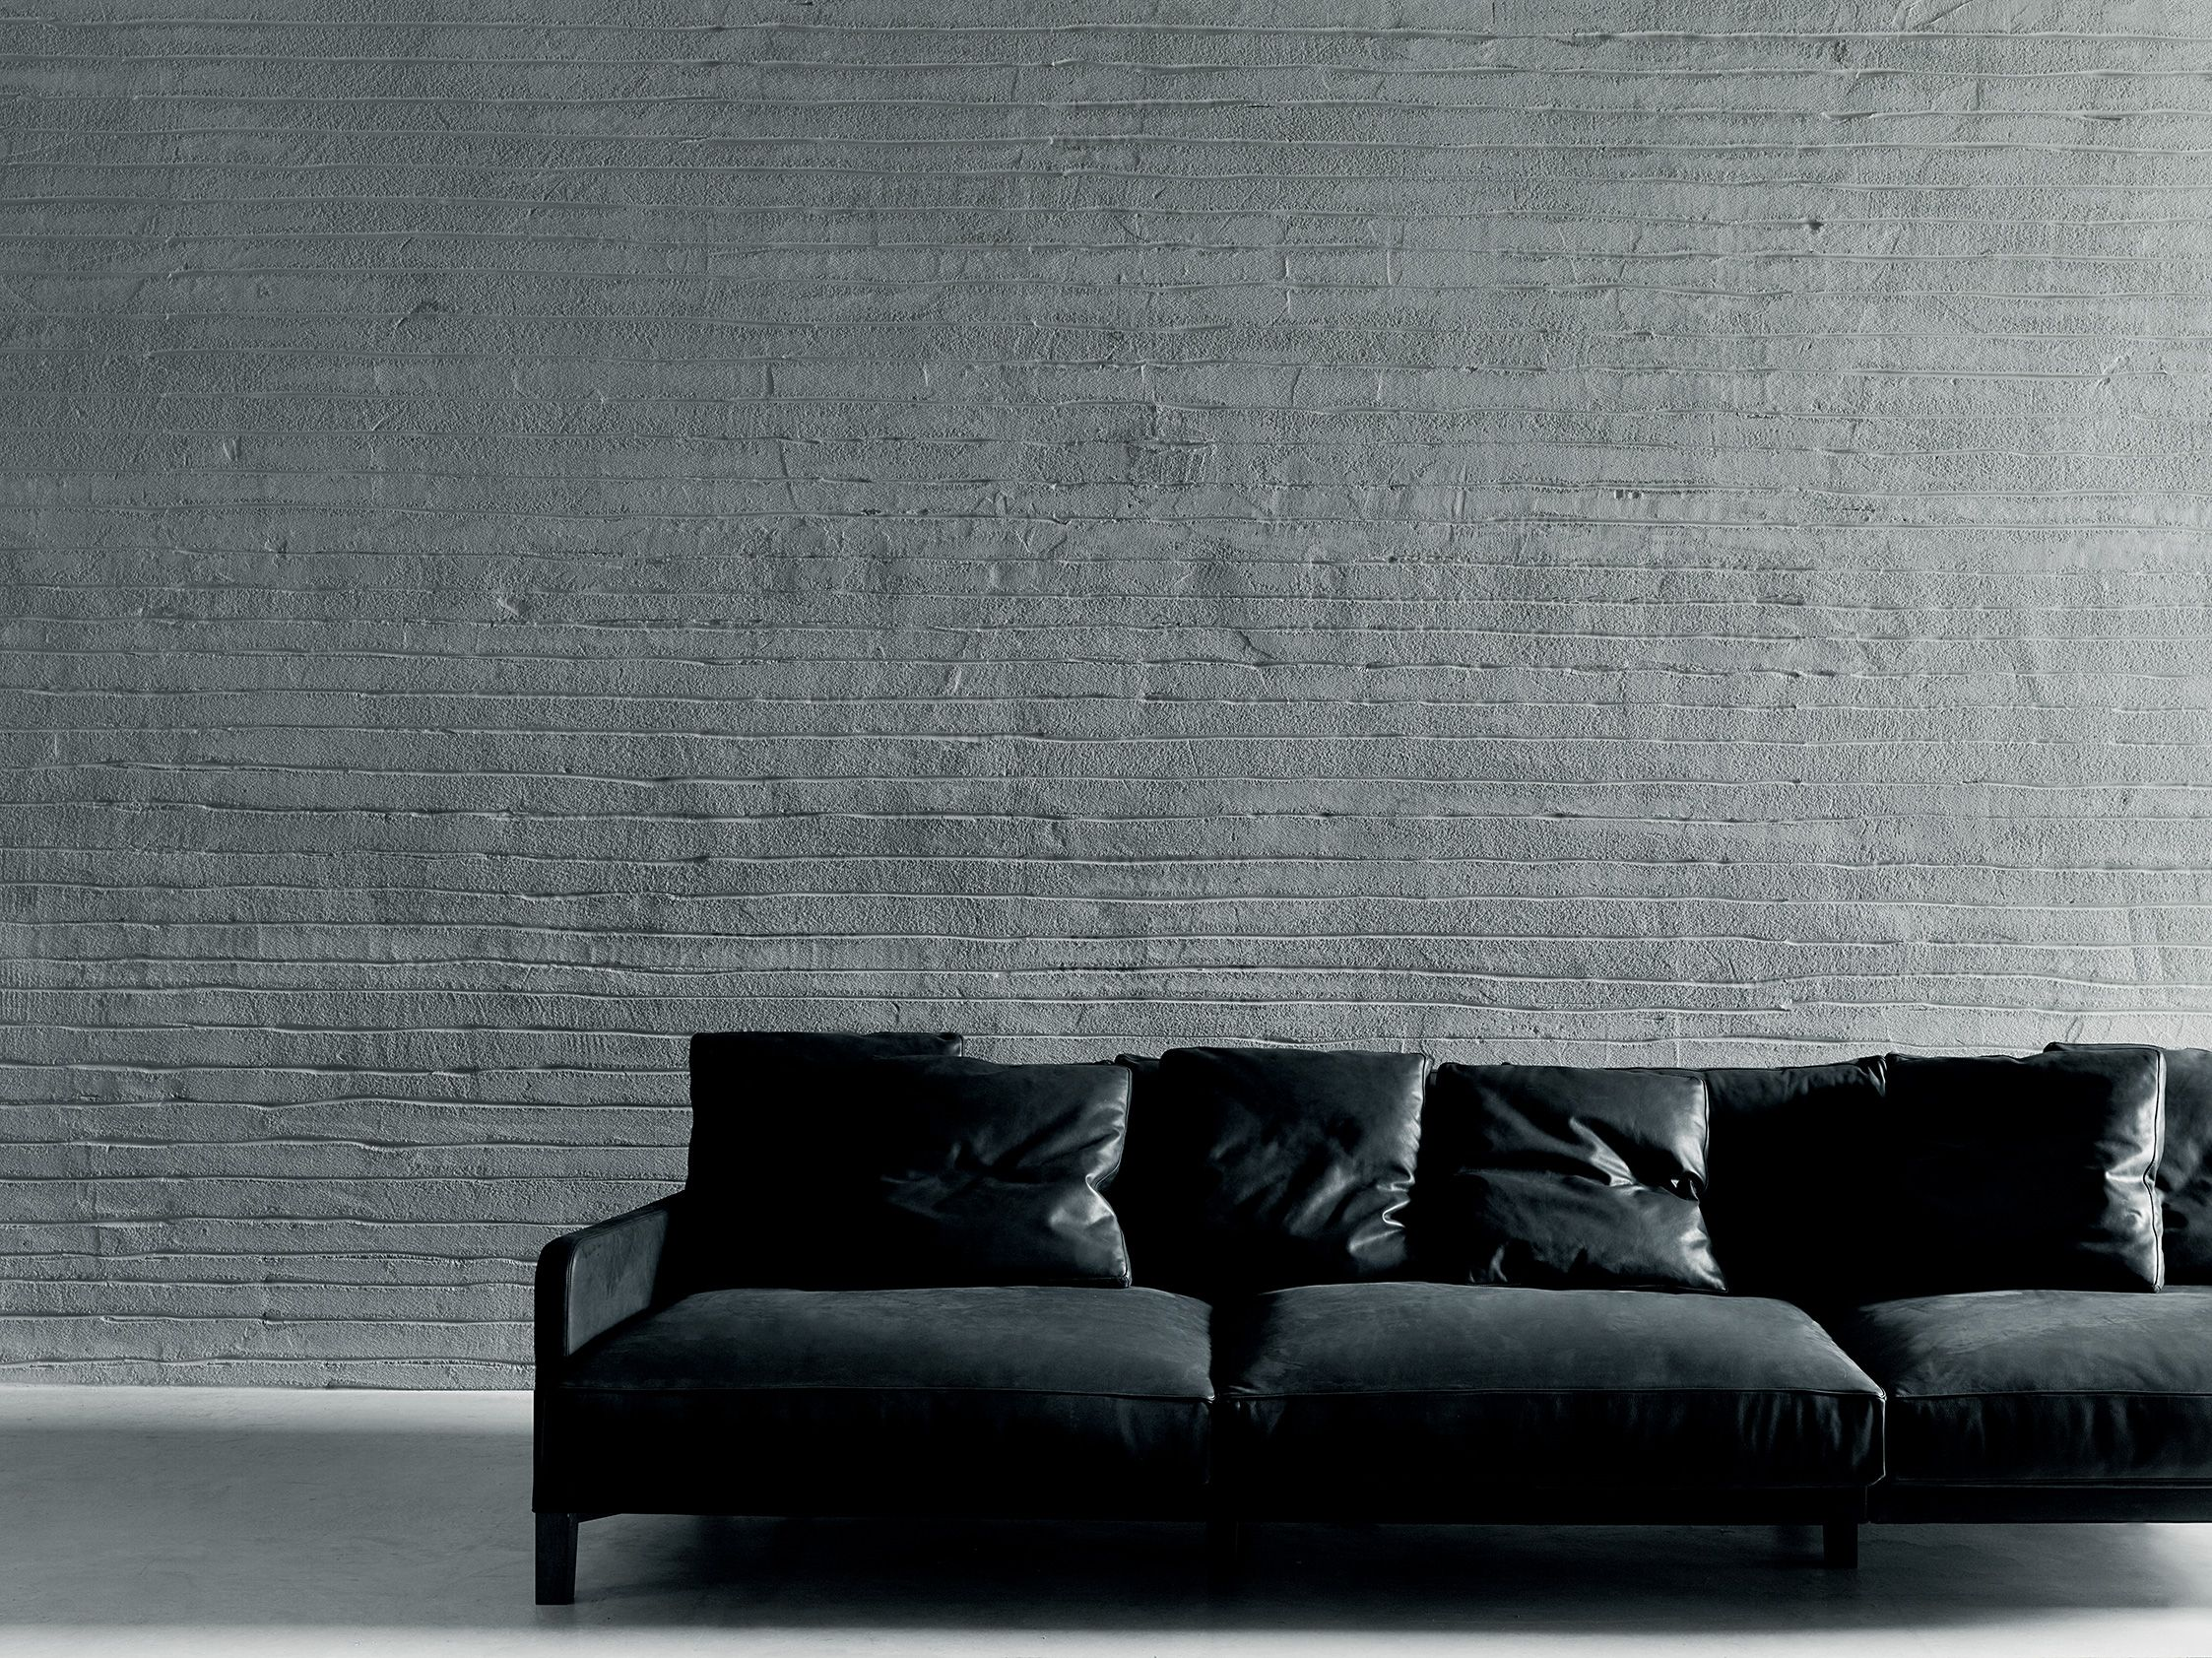 LIVING DIVANI: Dumas Design Piero Lissoni For Living Divani .   Da Vinci  Lifestyle   Worldu0027s Largest Furniture Group   Over 150 Brands   Worldwide  Delivery ...